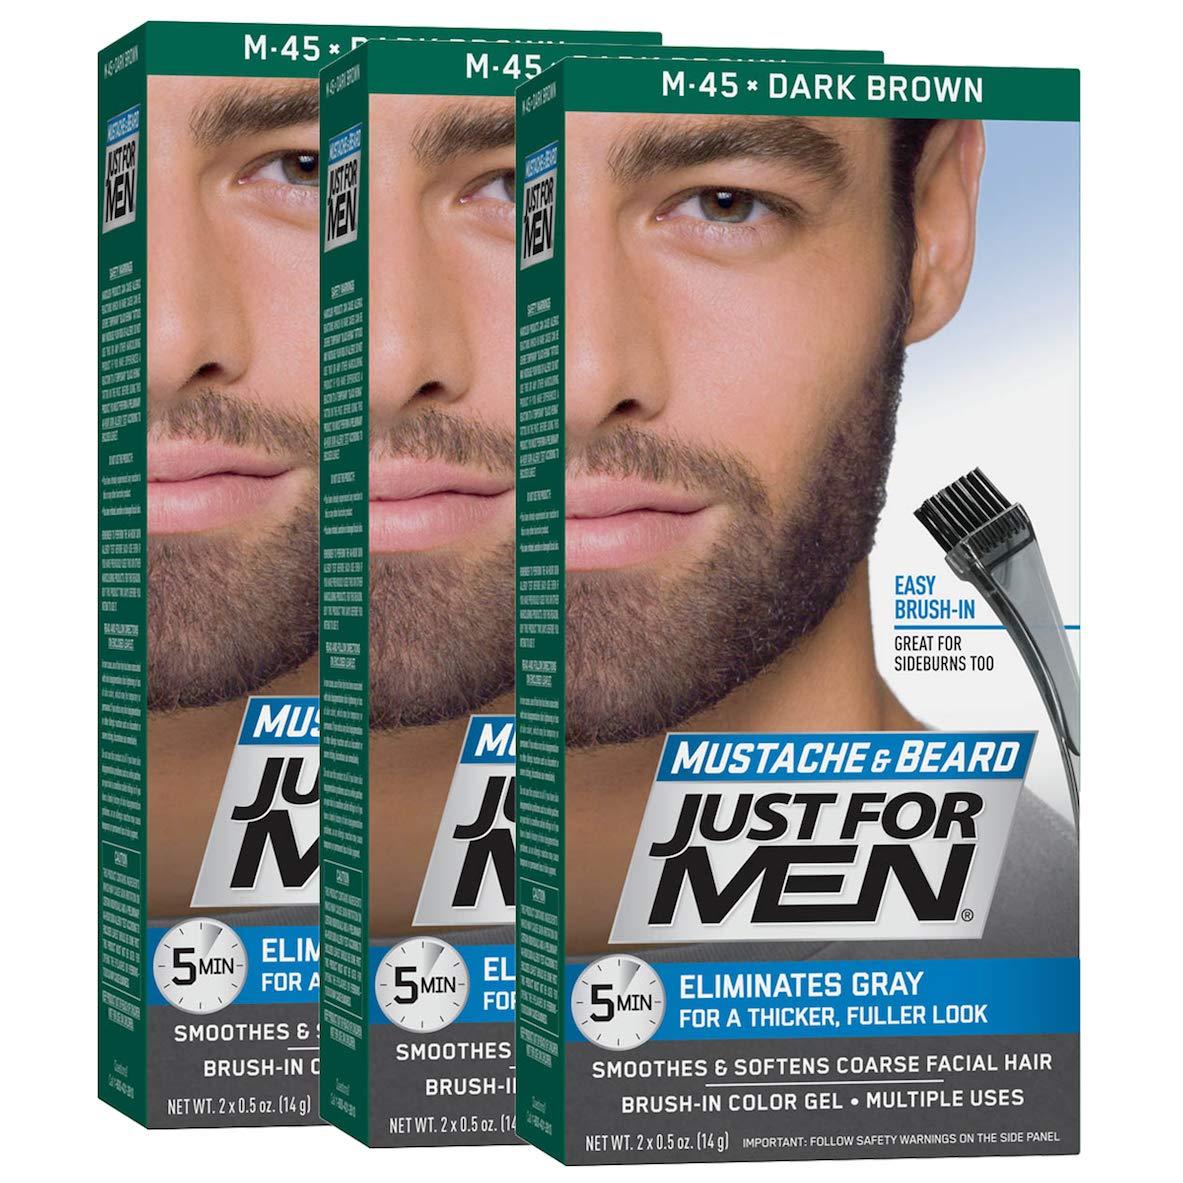 Just For Men Mustache & Beard Color, Beard Coloring for Men, Dark Brown (Pack of 3) by Just for Men